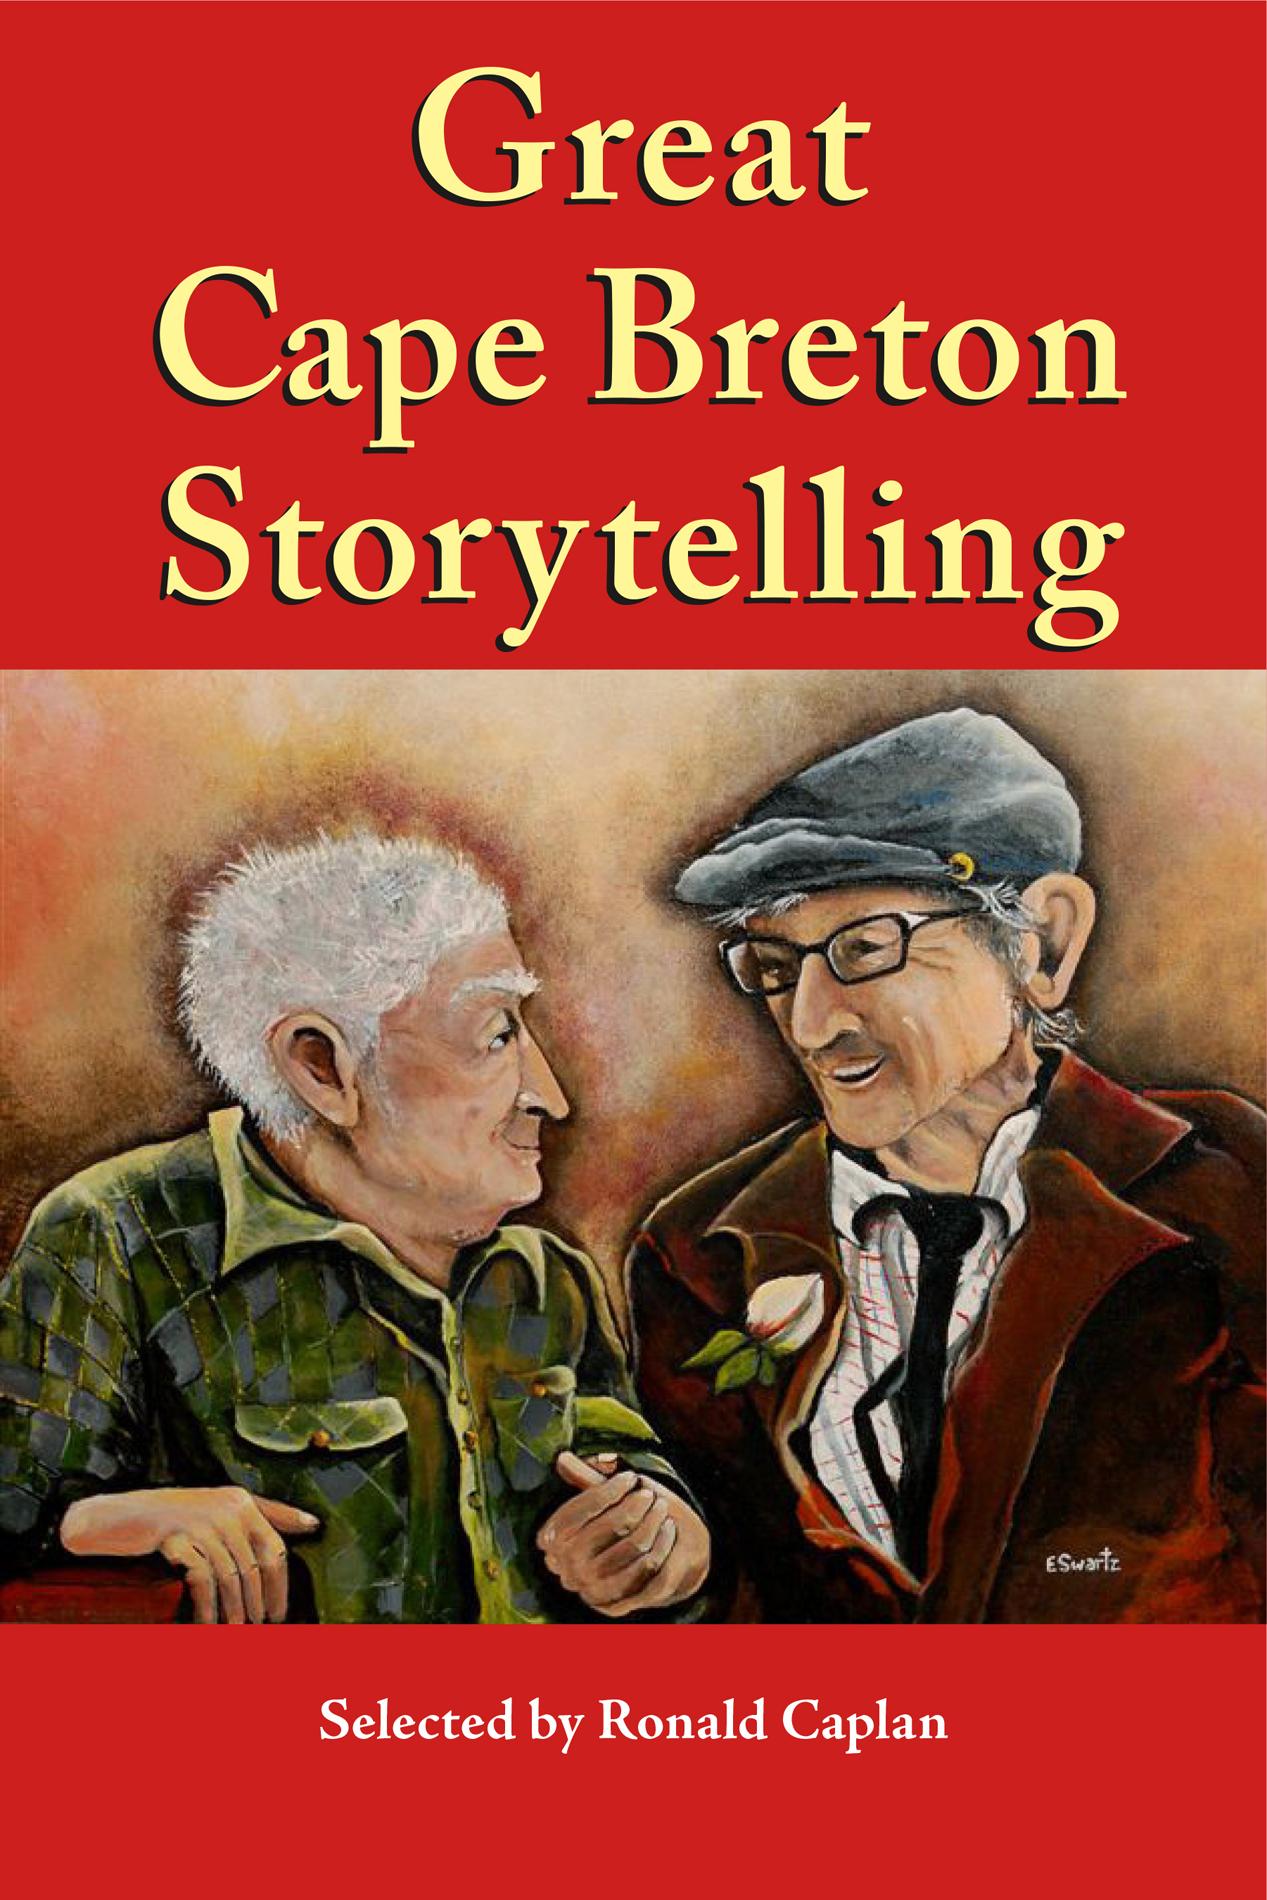 Great Cape Breton Storytelling